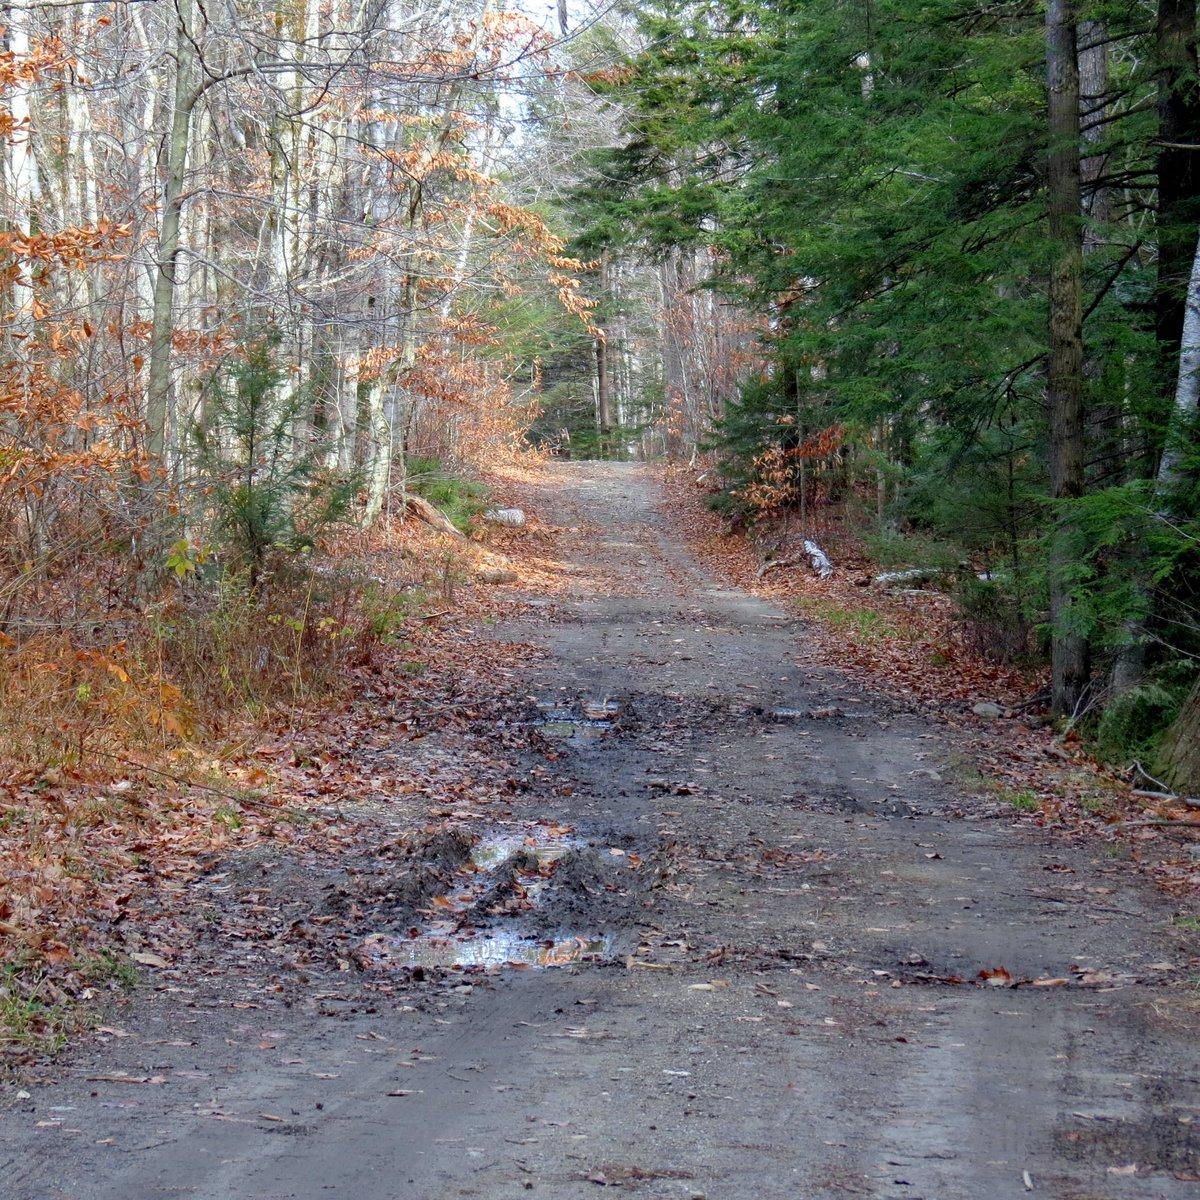 1. Road